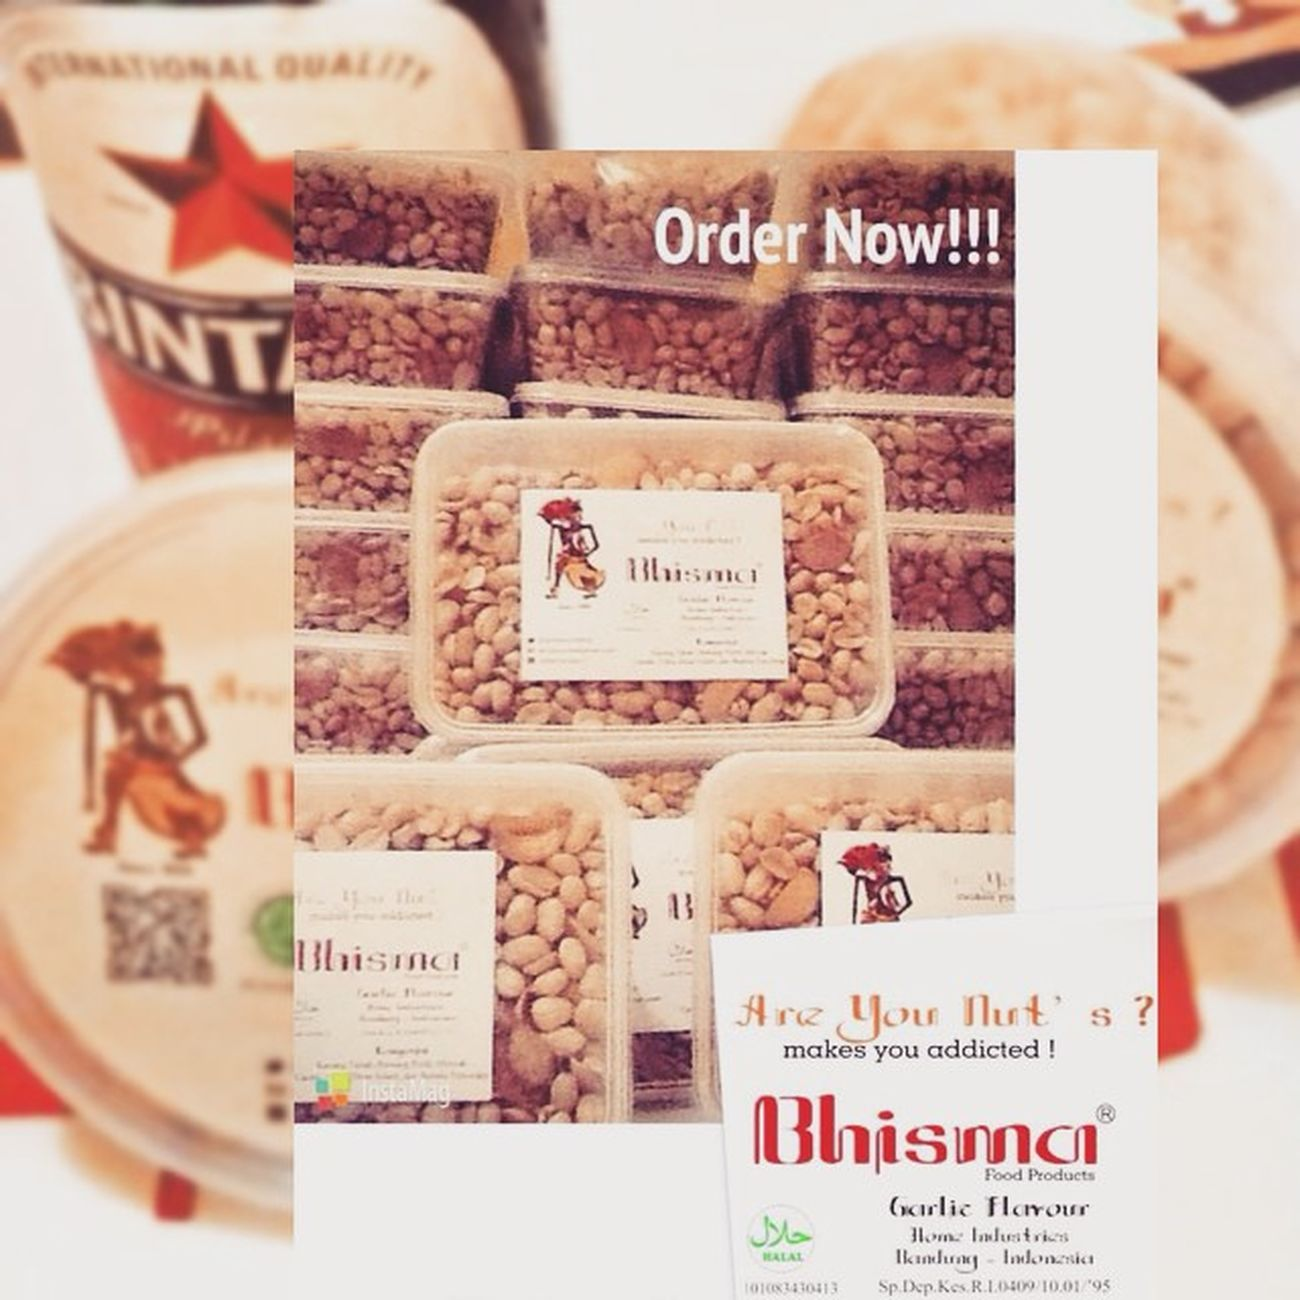 Bhisma Home Industries - Food Products Owner @BhismaMoo Email : Areyounutsbdg@gmail.com More info/order : 081572156668 Bandung - Indonesia Kulinerbandung Snack Cemilan  Bandung Areyounuts Lebaran